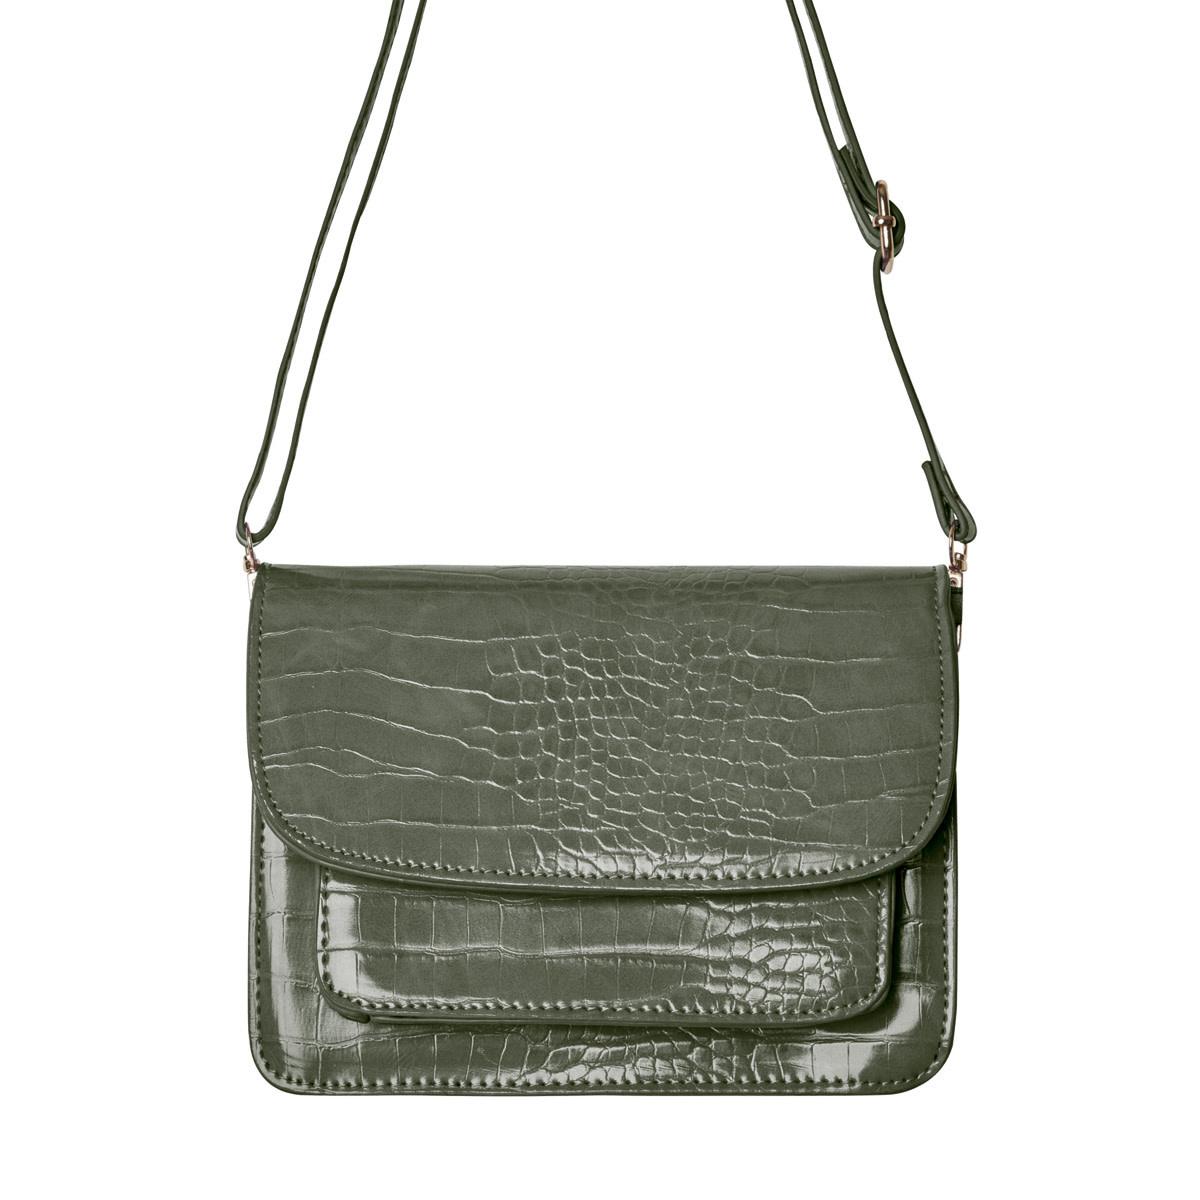 With love Bag Vogue - olive green 21cm x 13.50cm x 7cm